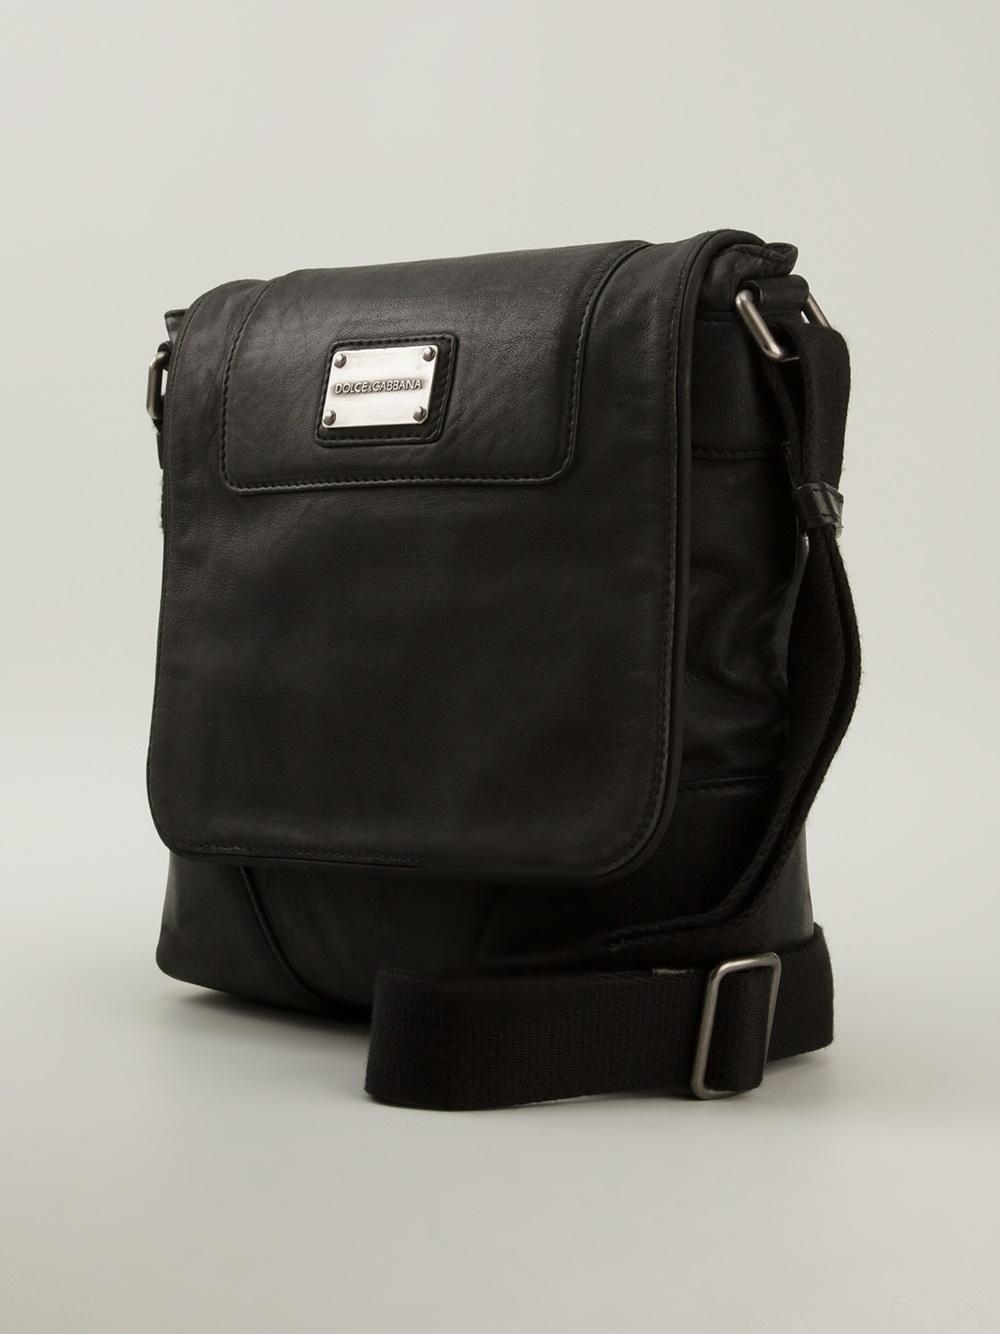 5f7f977b683 Dolce & Gabbana Classic Messenger Bag in Black for Men - Lyst